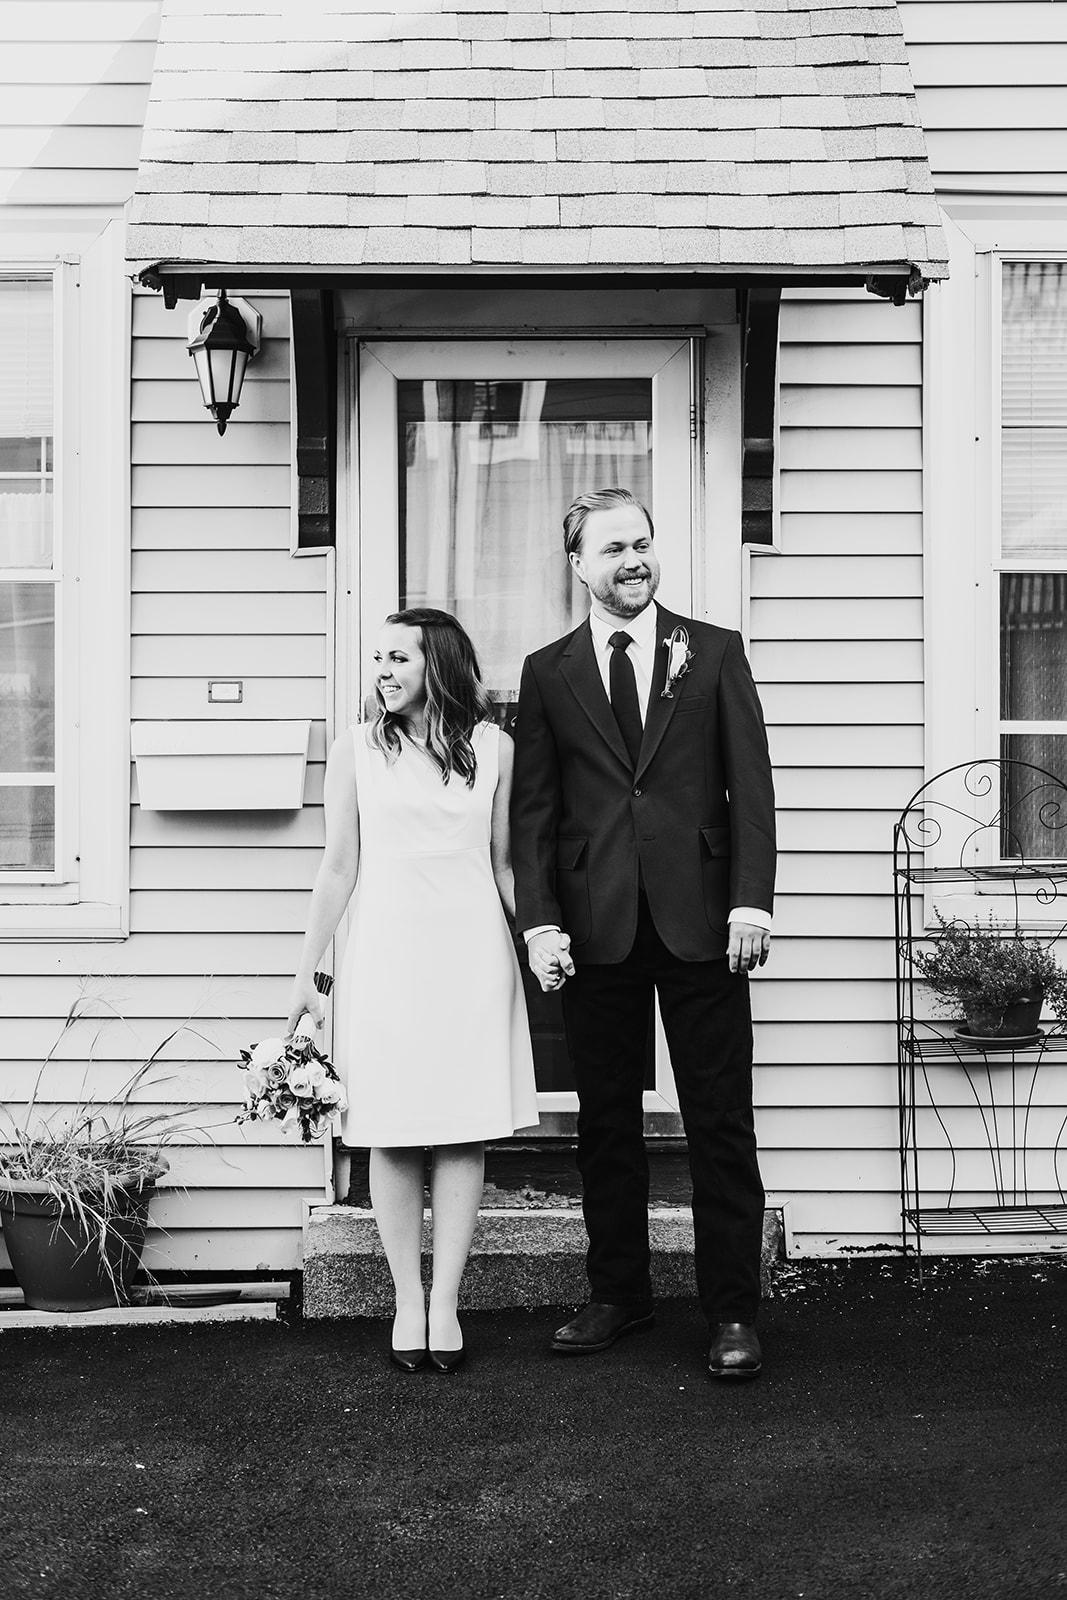 Wedding_Francis_Boucher_Elopement_Cambridge_MA_2018-9.jpg